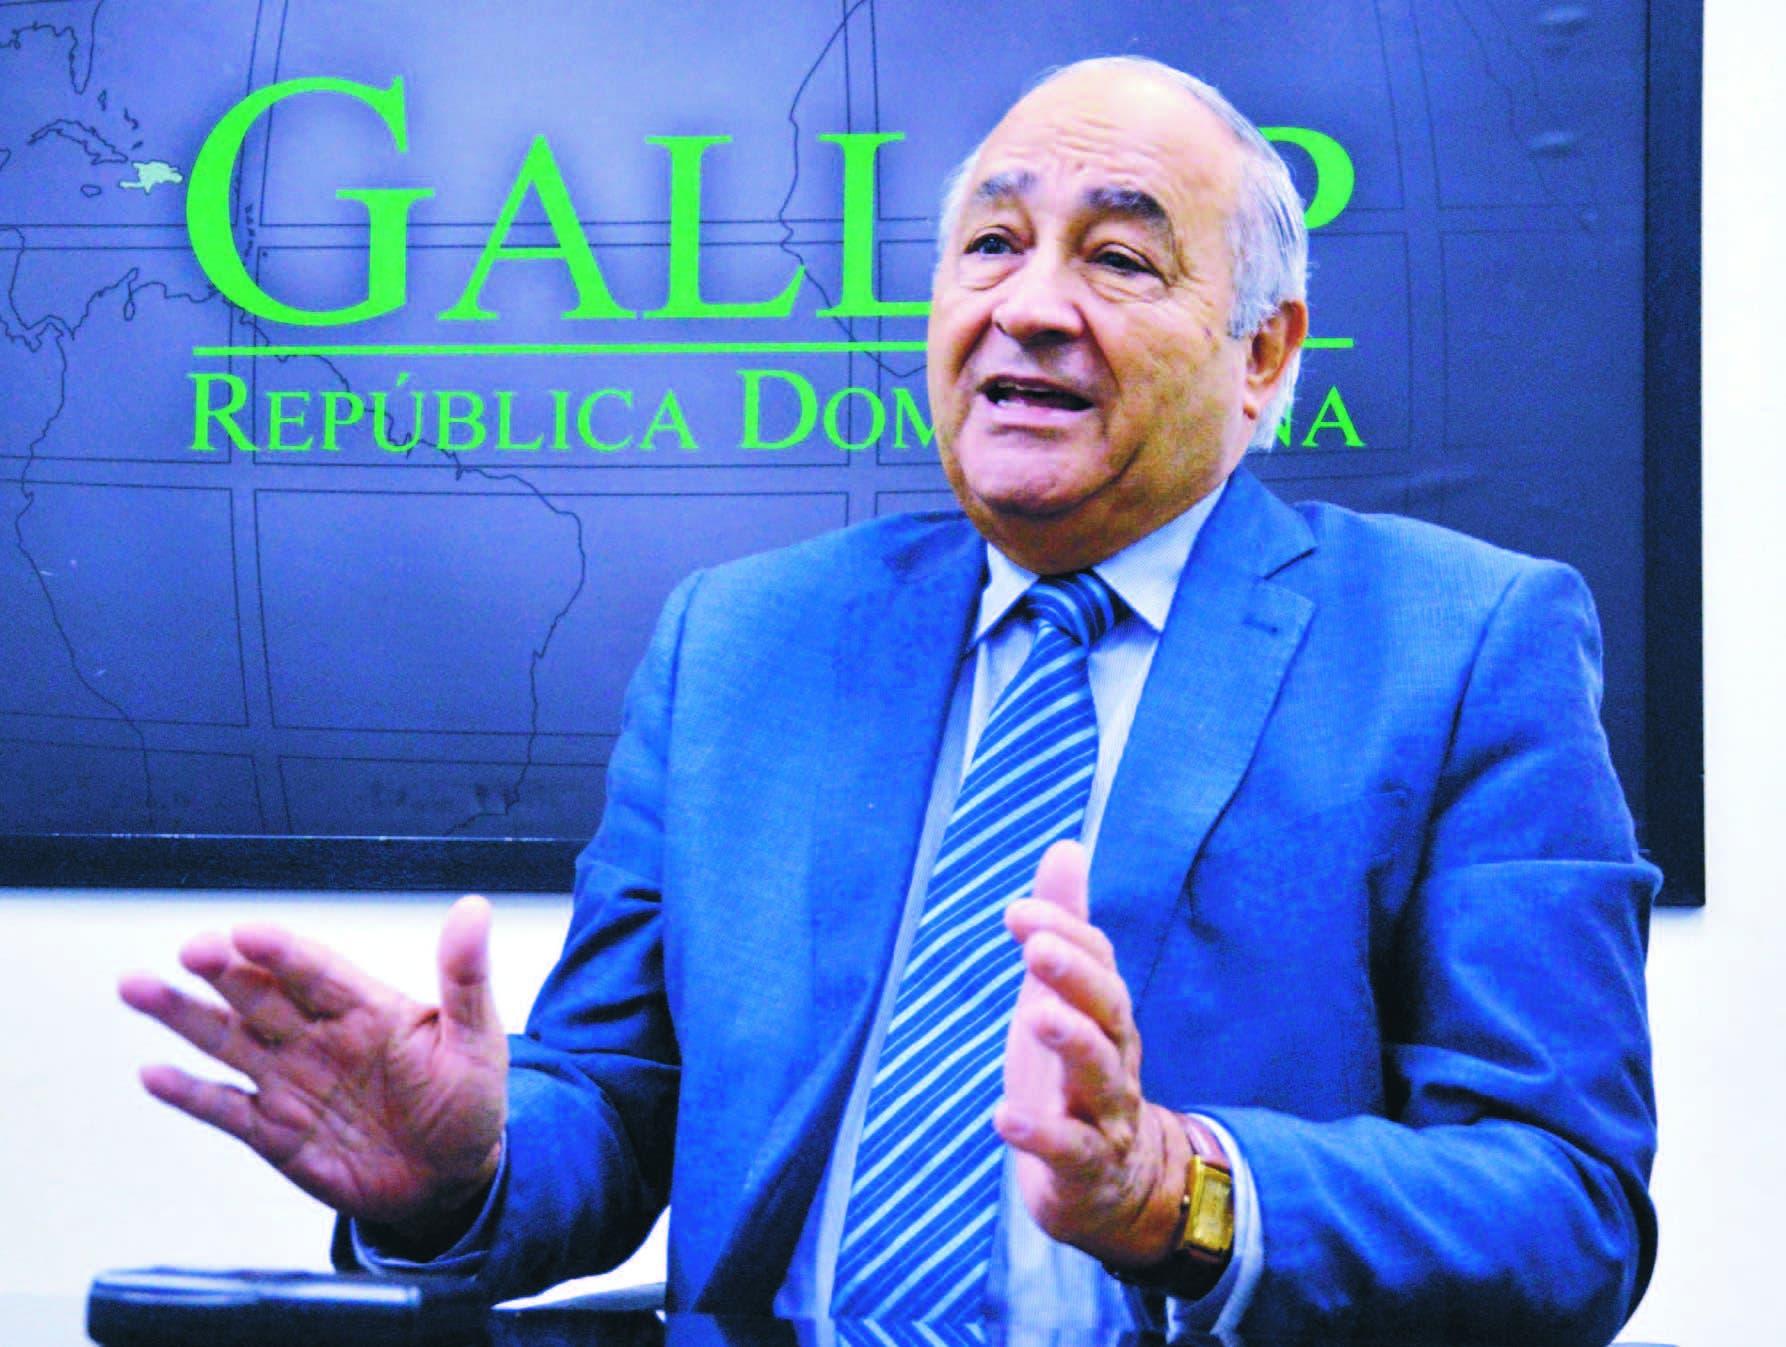 Gallup Dominicana recibe el Premio Data Quality Royal Star - Hoy Digital (República Dominicana)